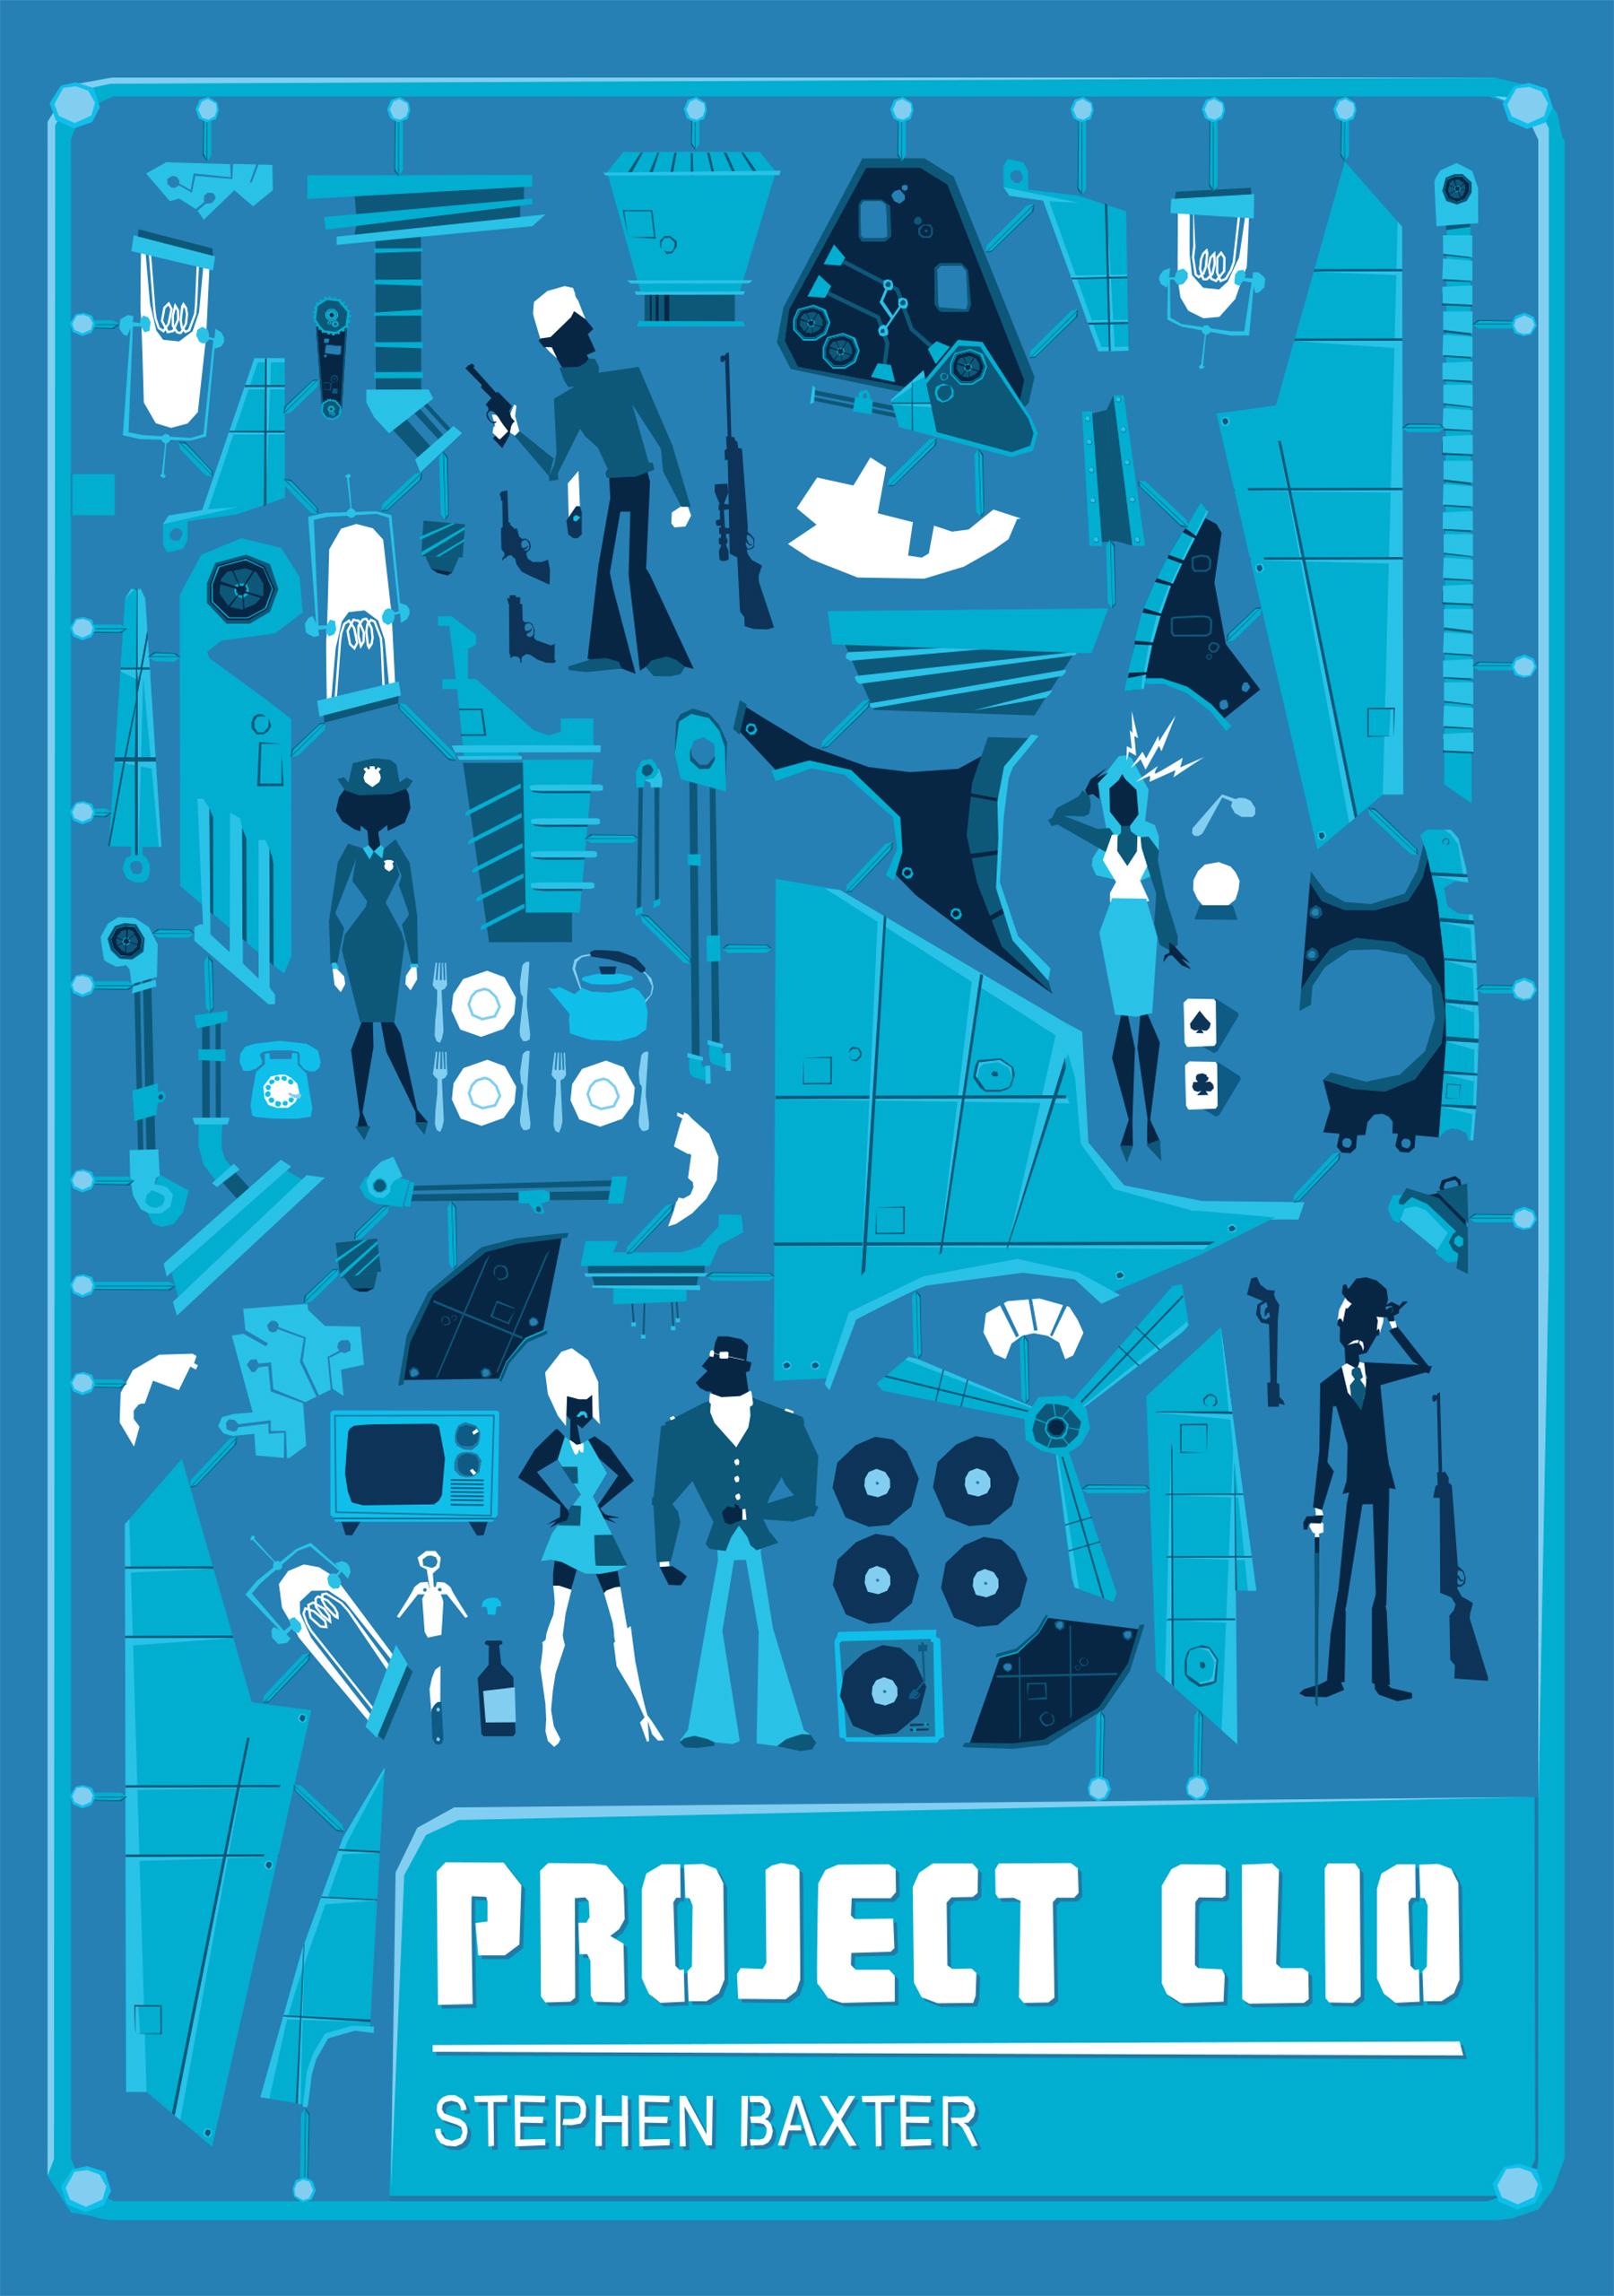 project clio.jpg